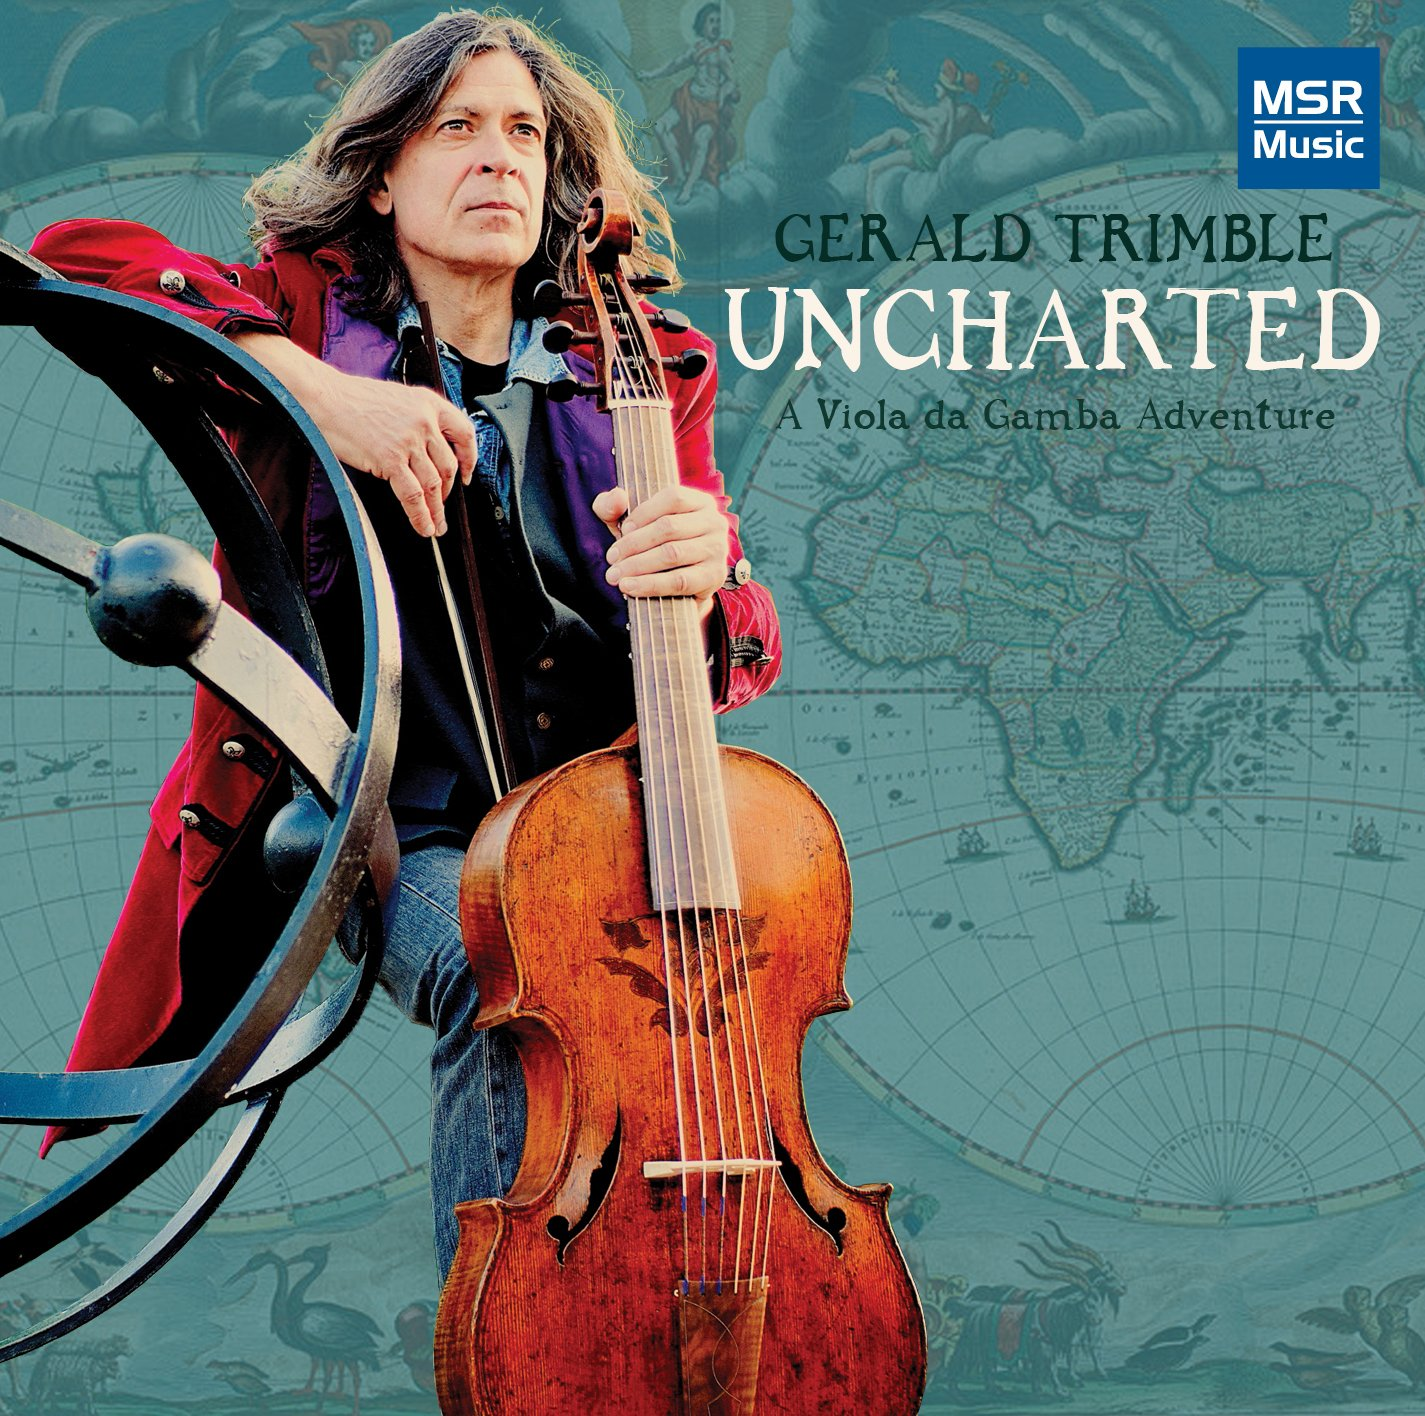 Uncharted: A Viola da Gamba Adventure with Gerald Trimble